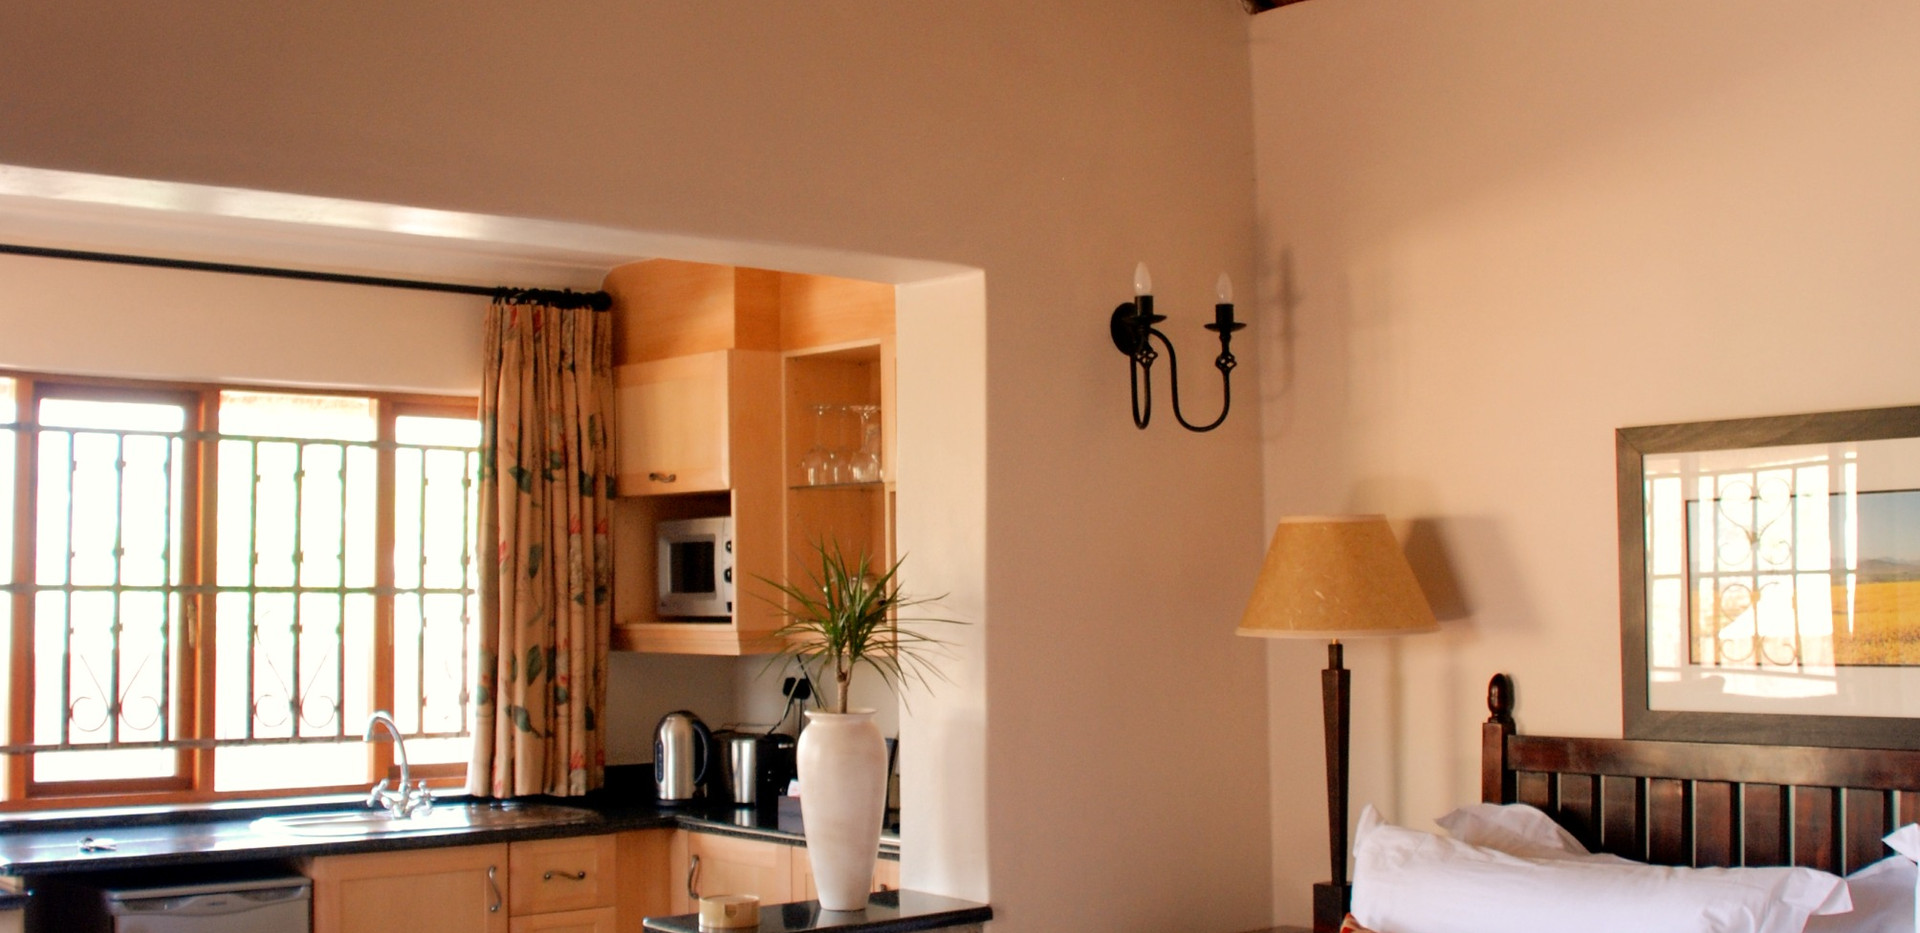 Protea apartment 1